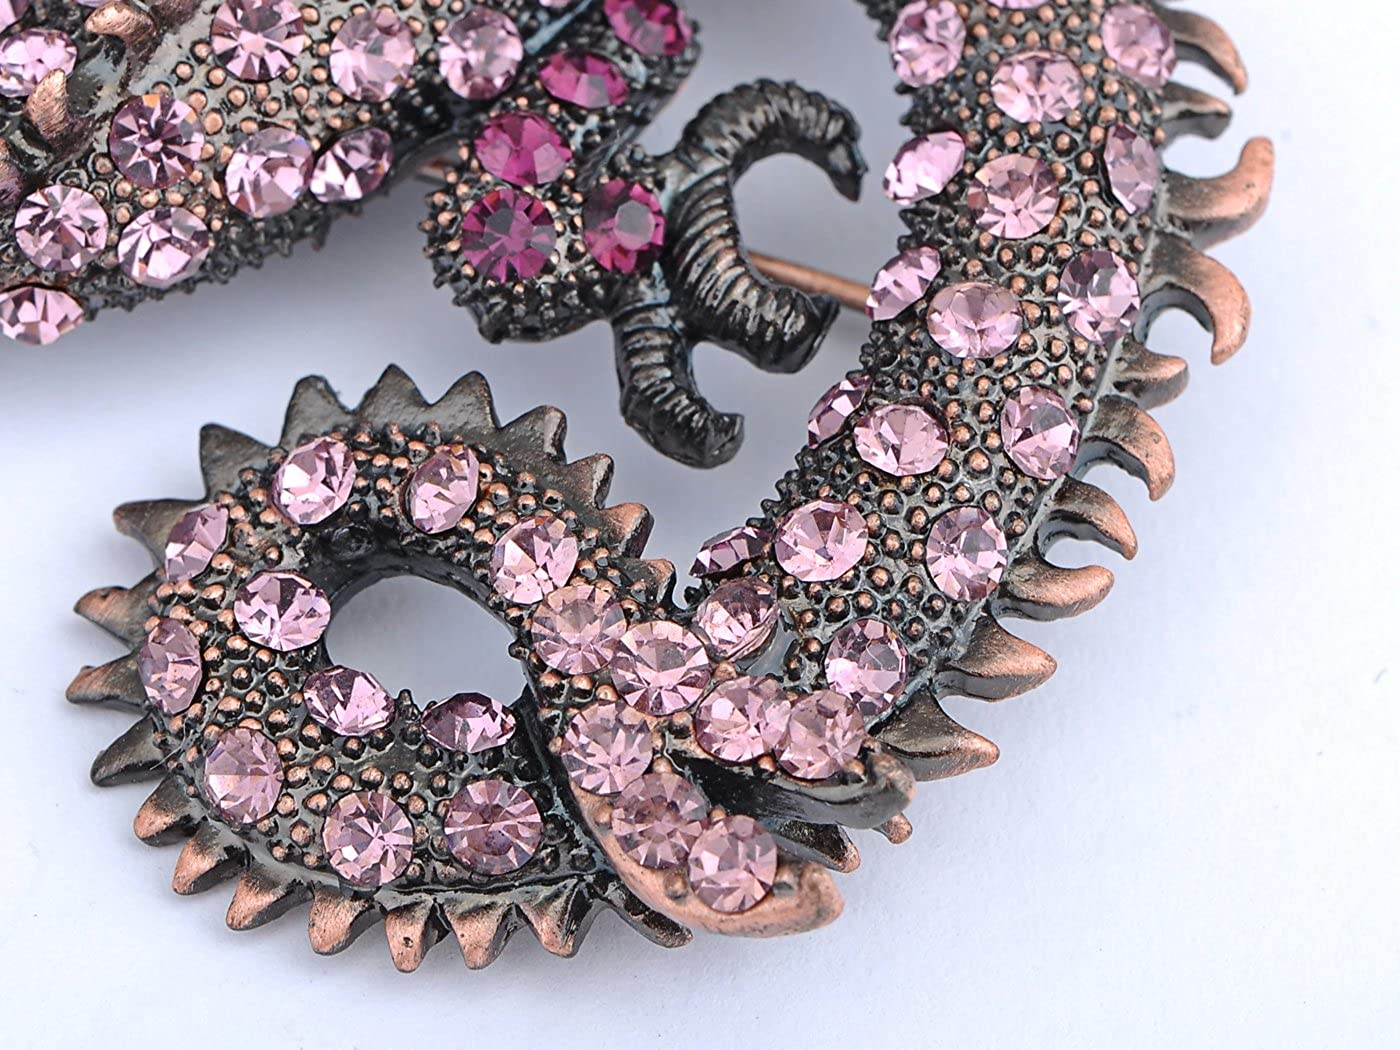 Alilang Antique Rust Gunmetal Fantasy Renaissance Medieval Dragon Pink Crystal Rhinestone Brooch Pin